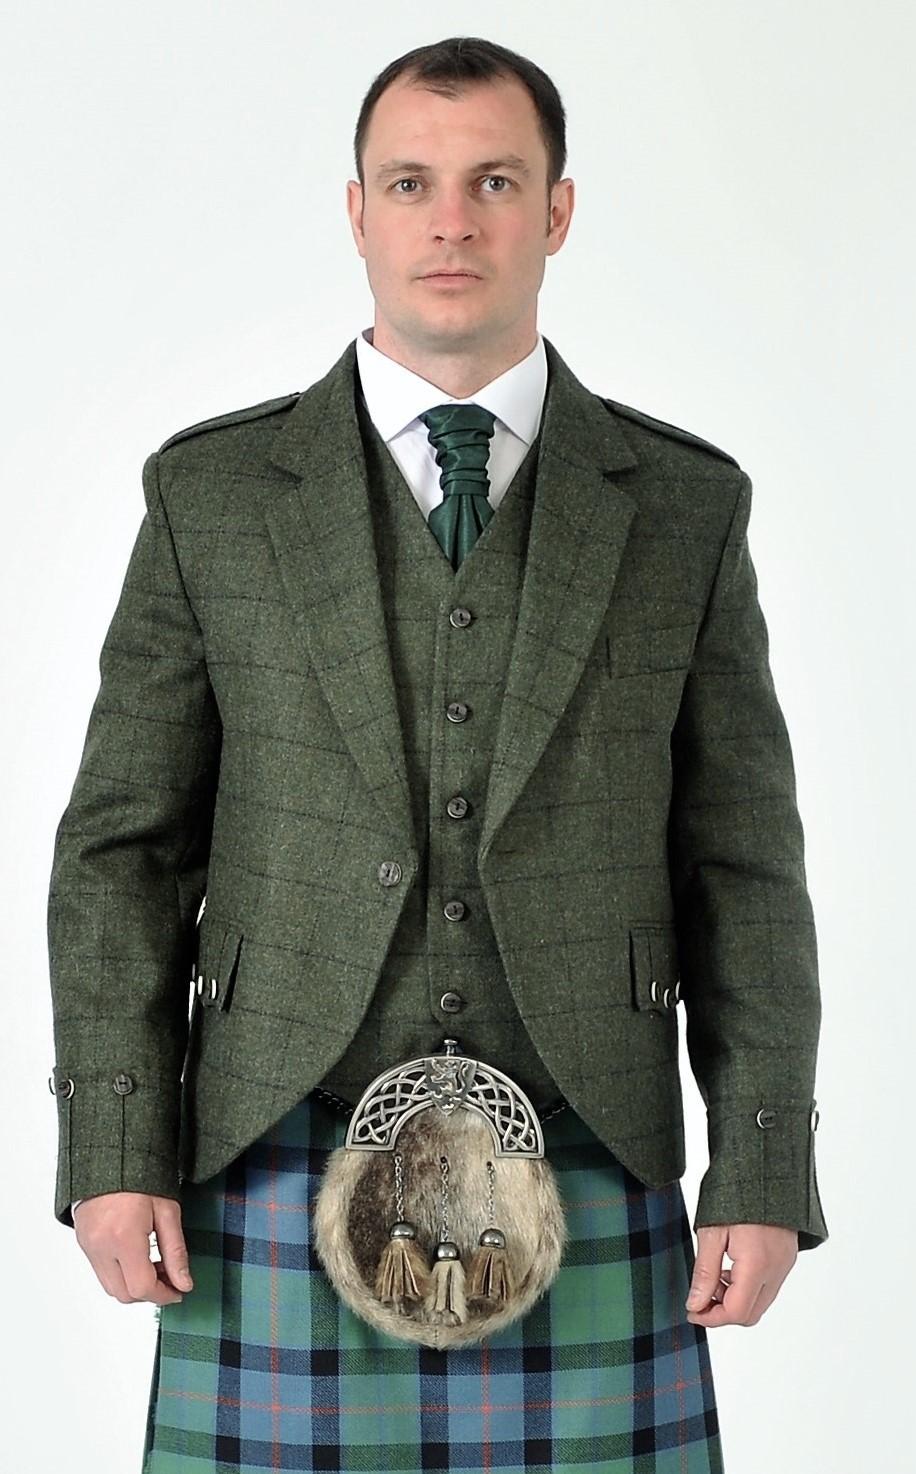 Argyll tweed Jacket With Waistcoat by Scottish KiltMade To Measure